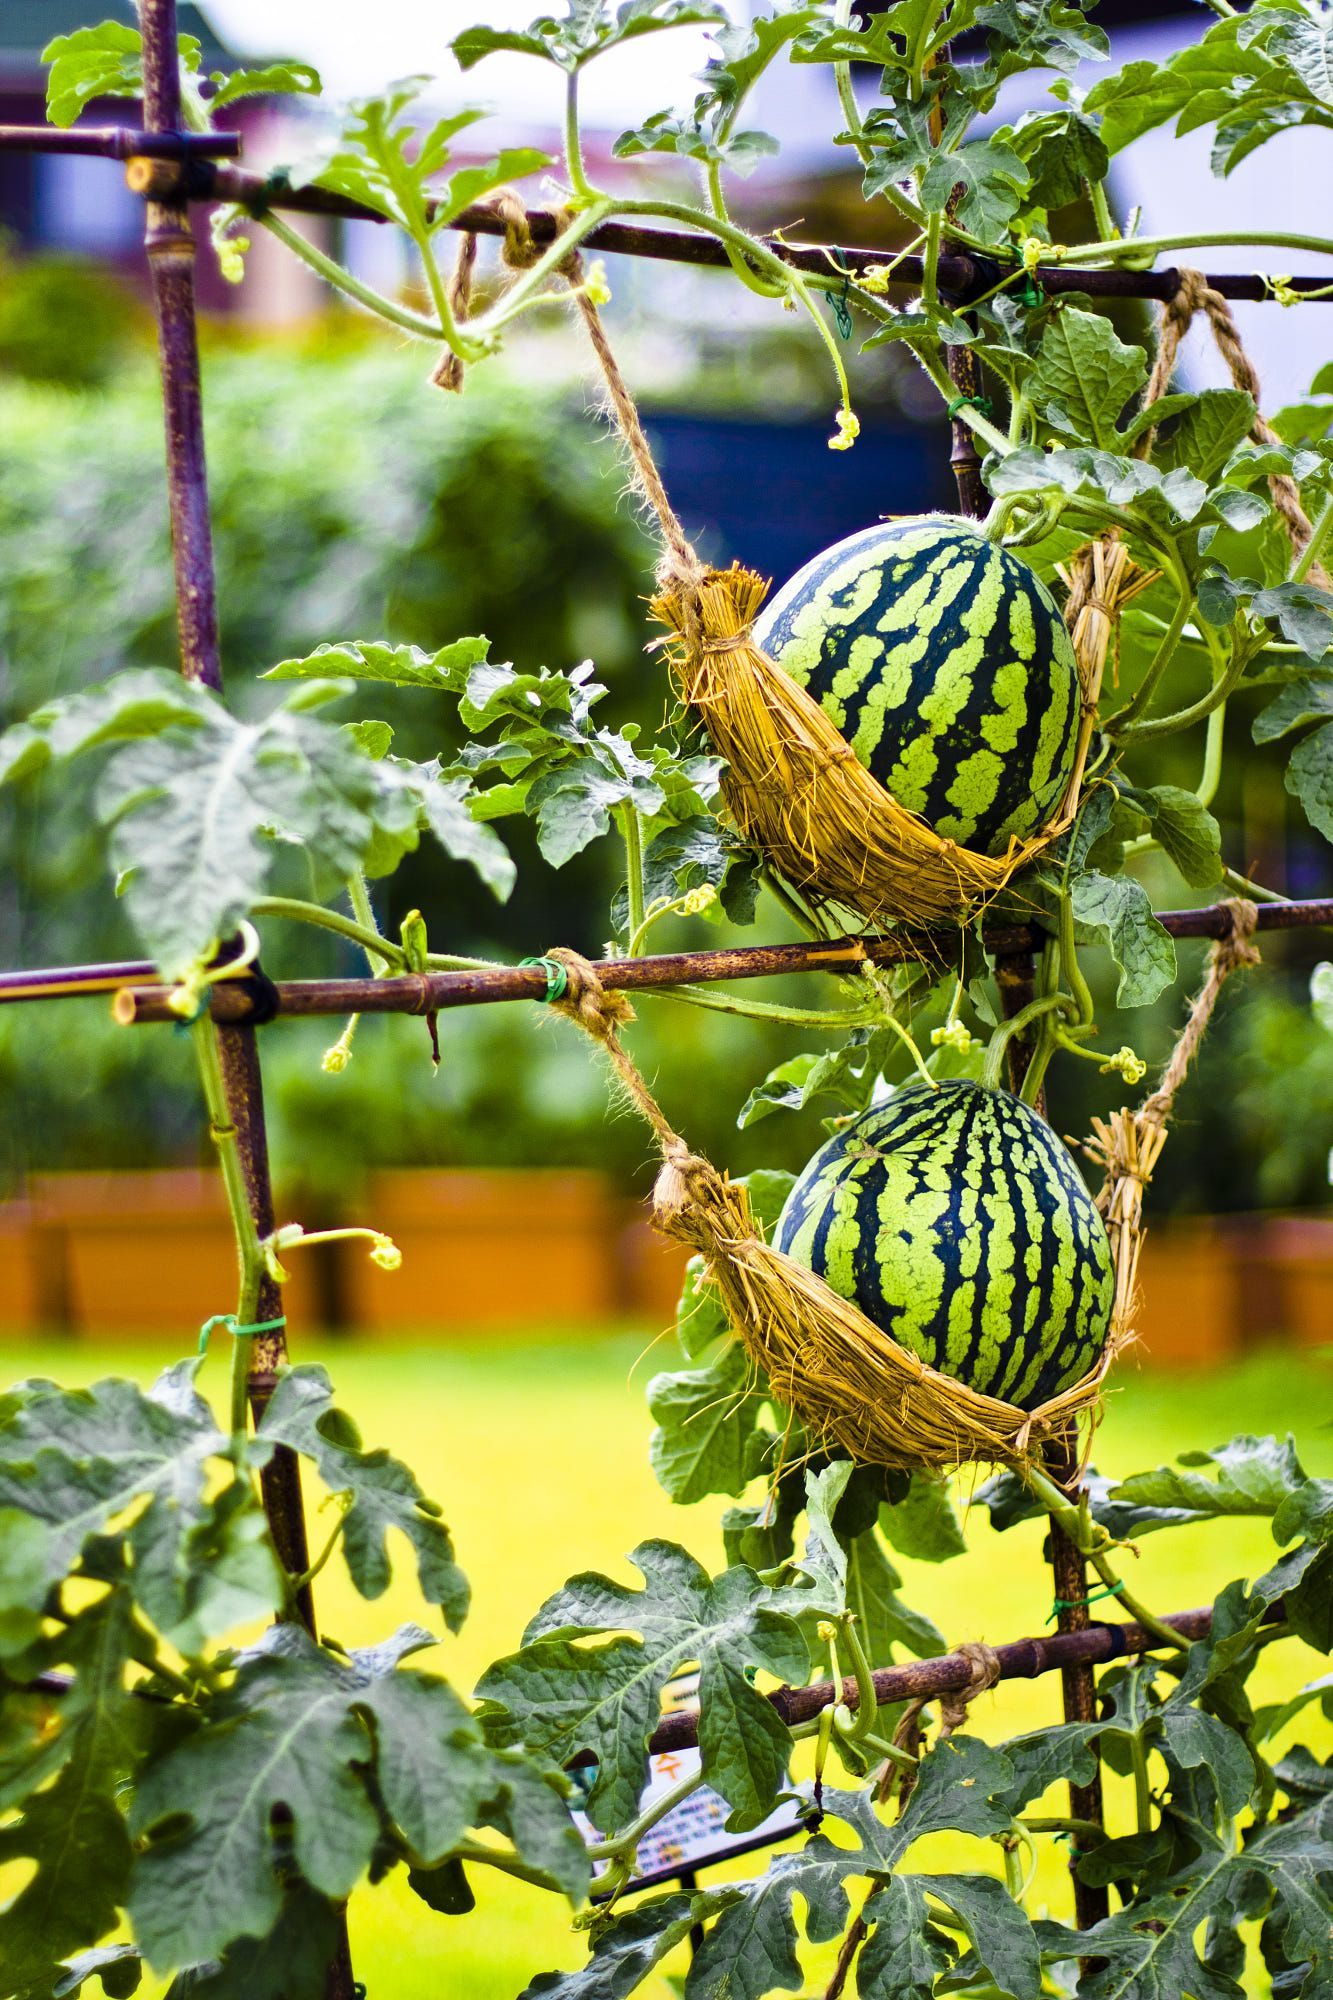 Summer Watermelon By John Rhee ไอเดียแต่งสวน 400 x 300